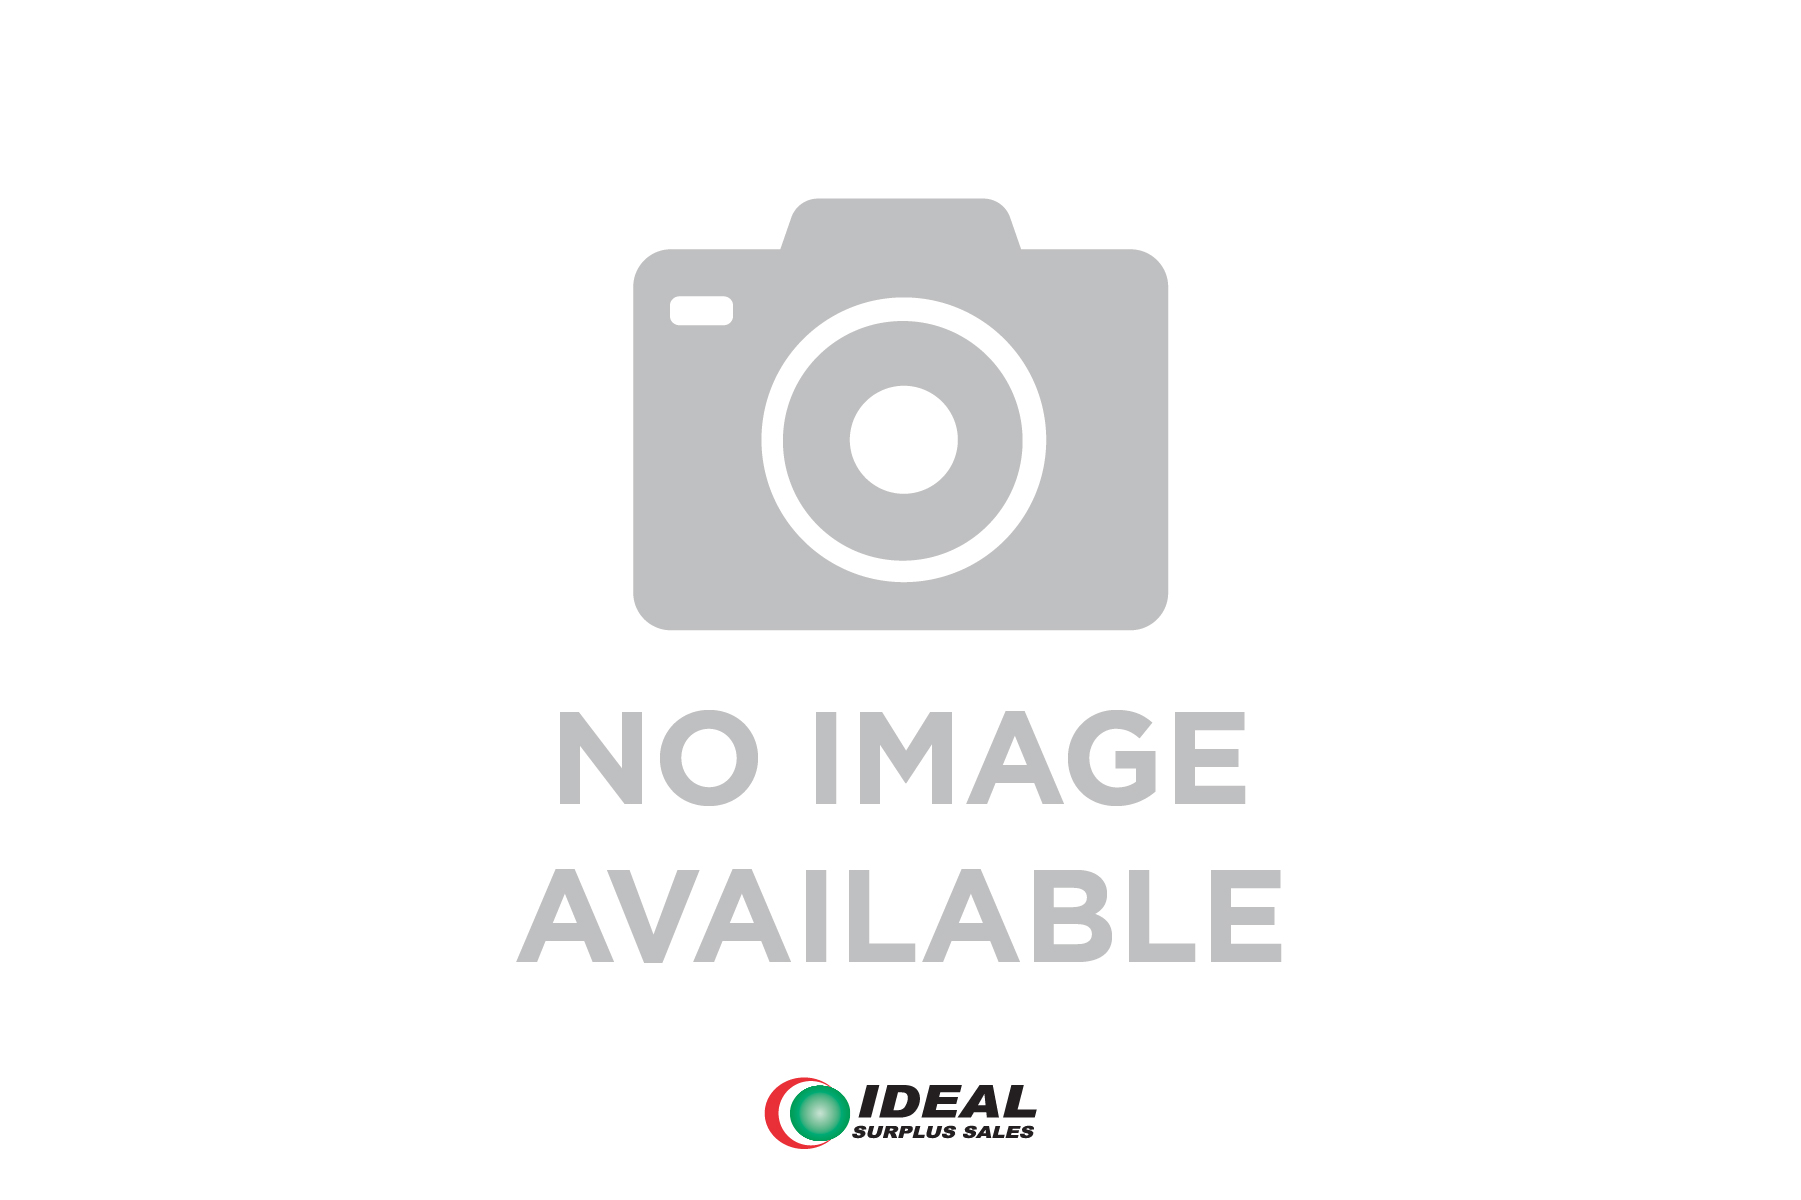 HONEYWELL 91MCE2P1 New in Box